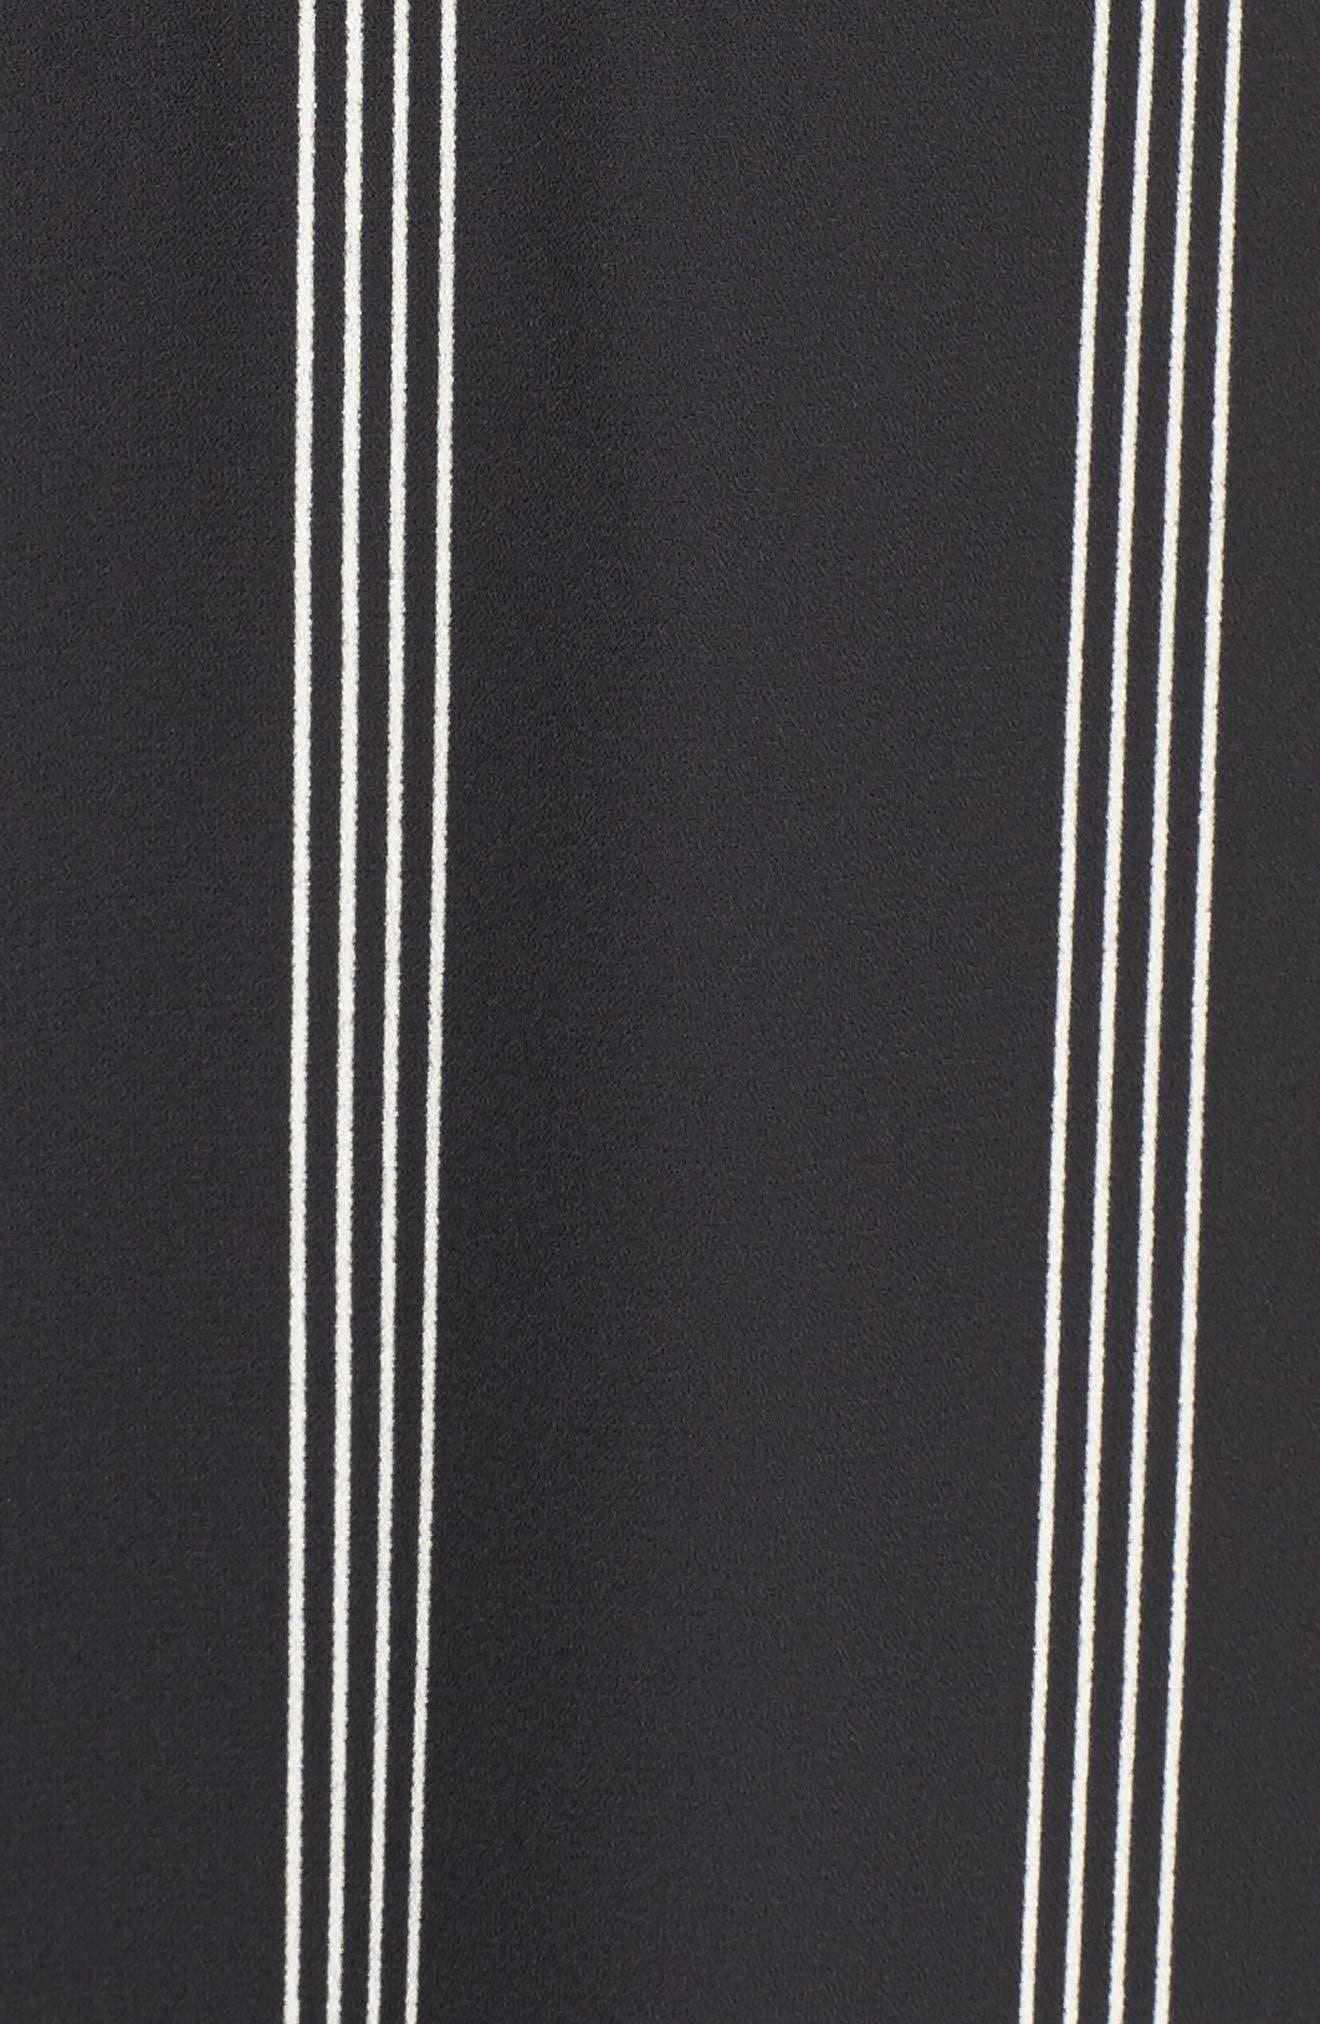 Stripe Fit & Flare Dress,                             Alternate thumbnail 5, color,                             002